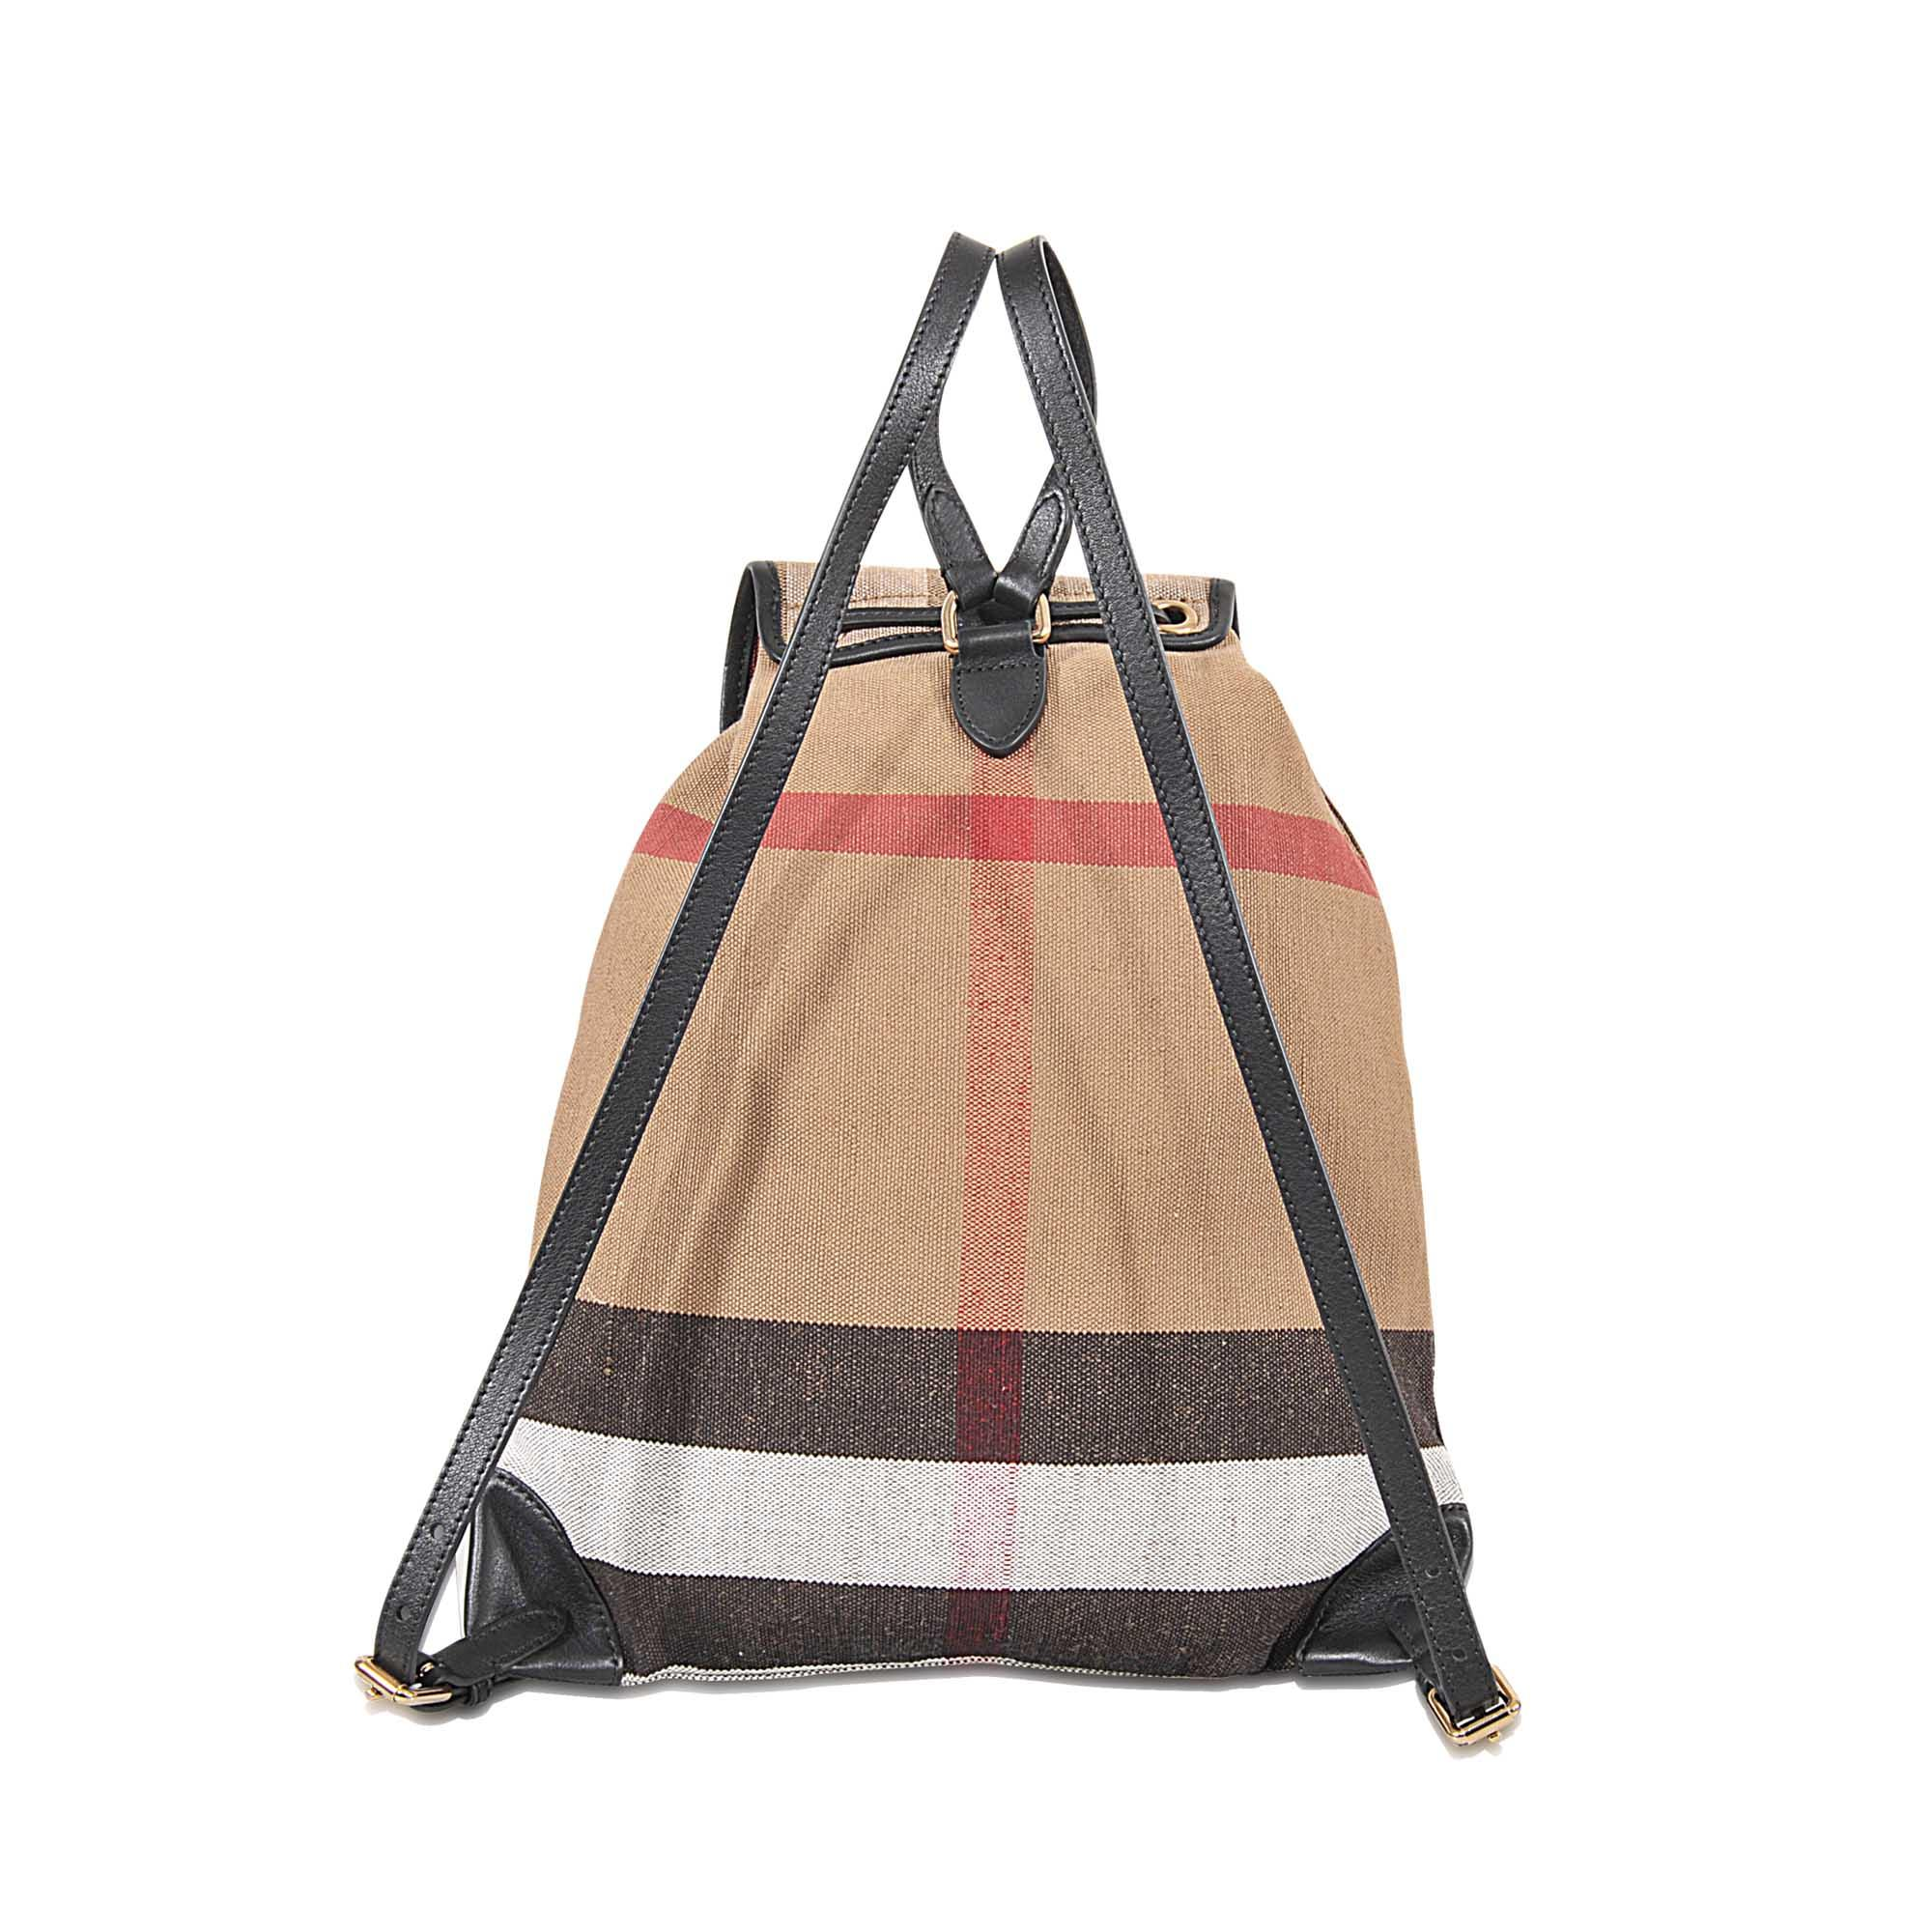 Burberry Canvas Medium Chiltern Bag in Black